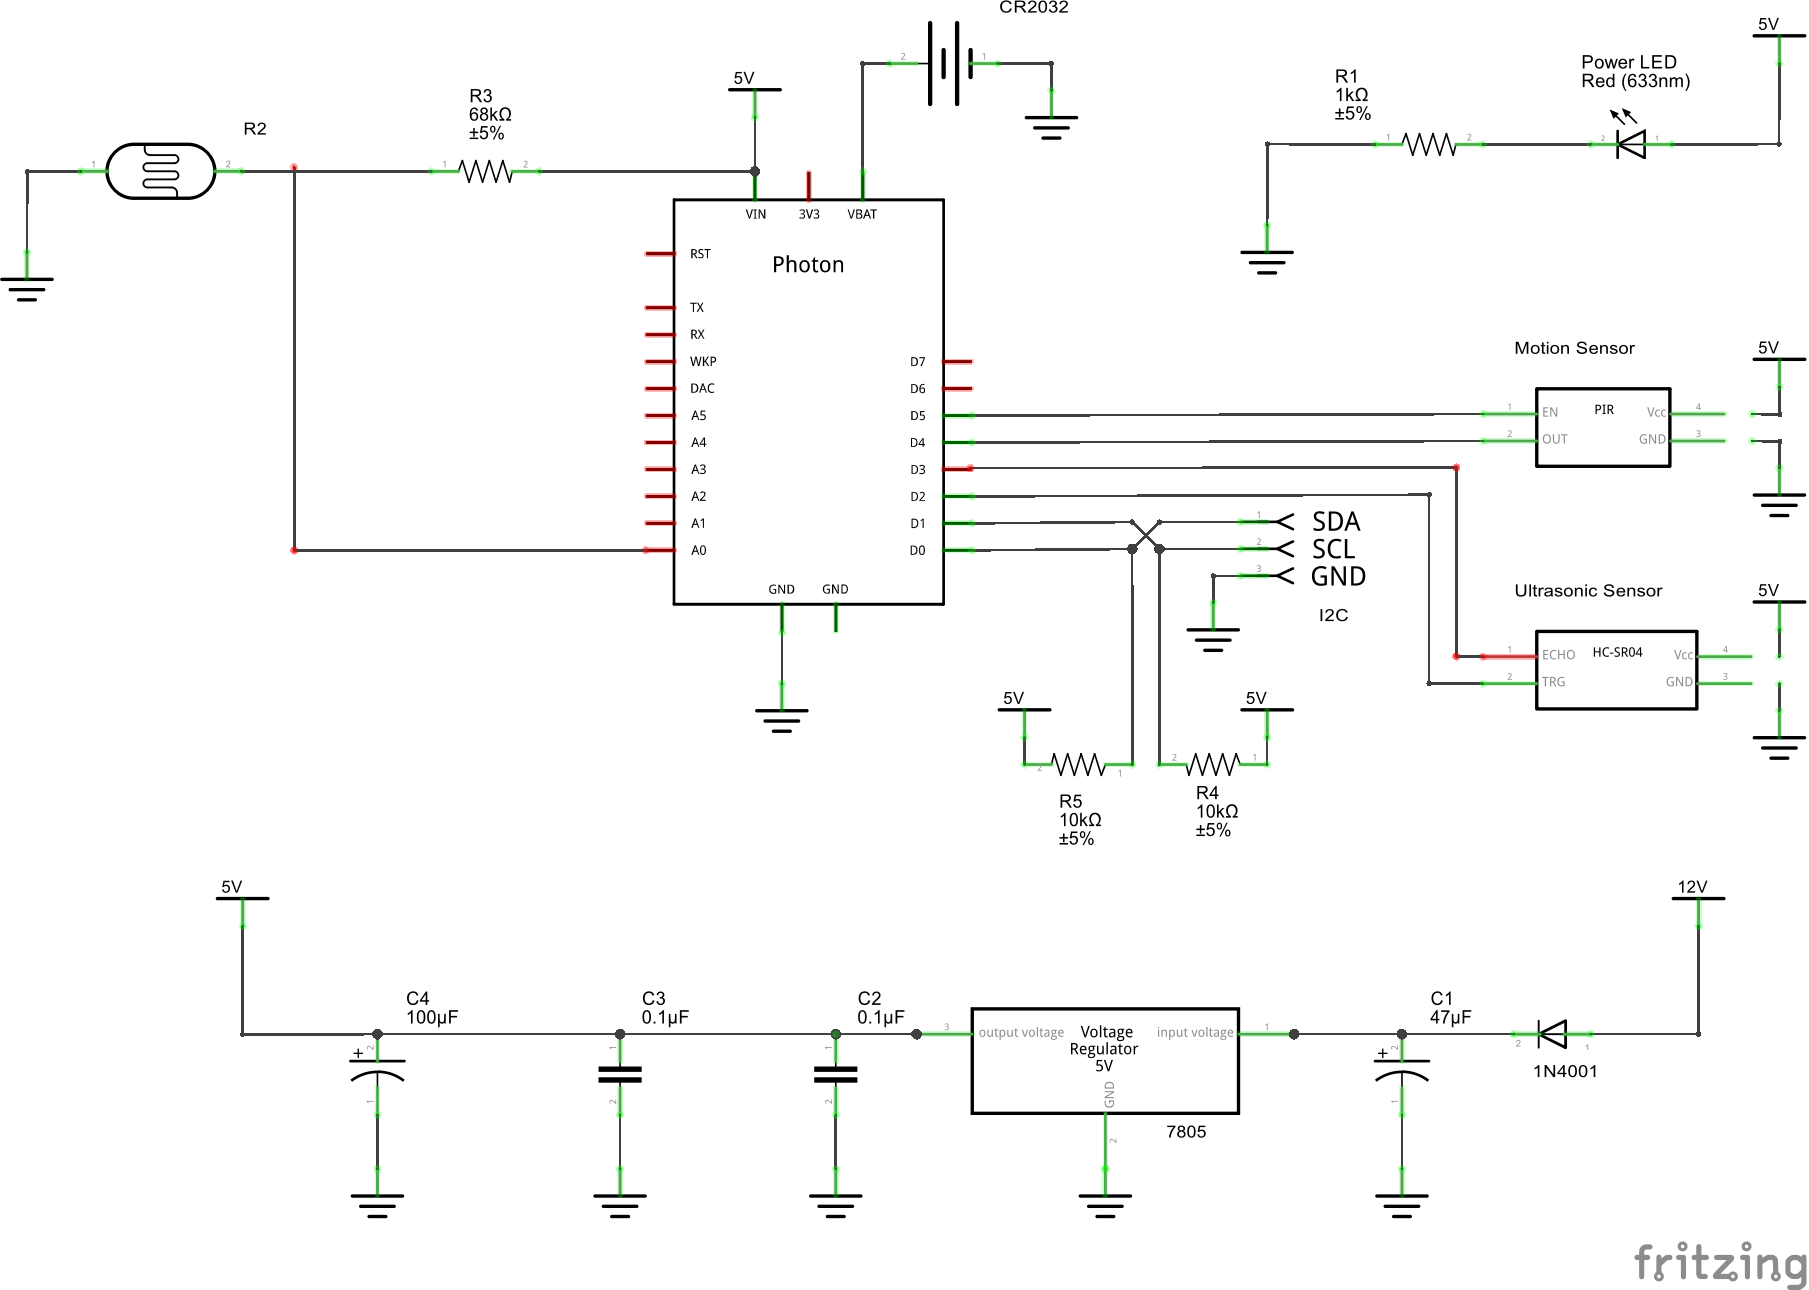 Main controller schem